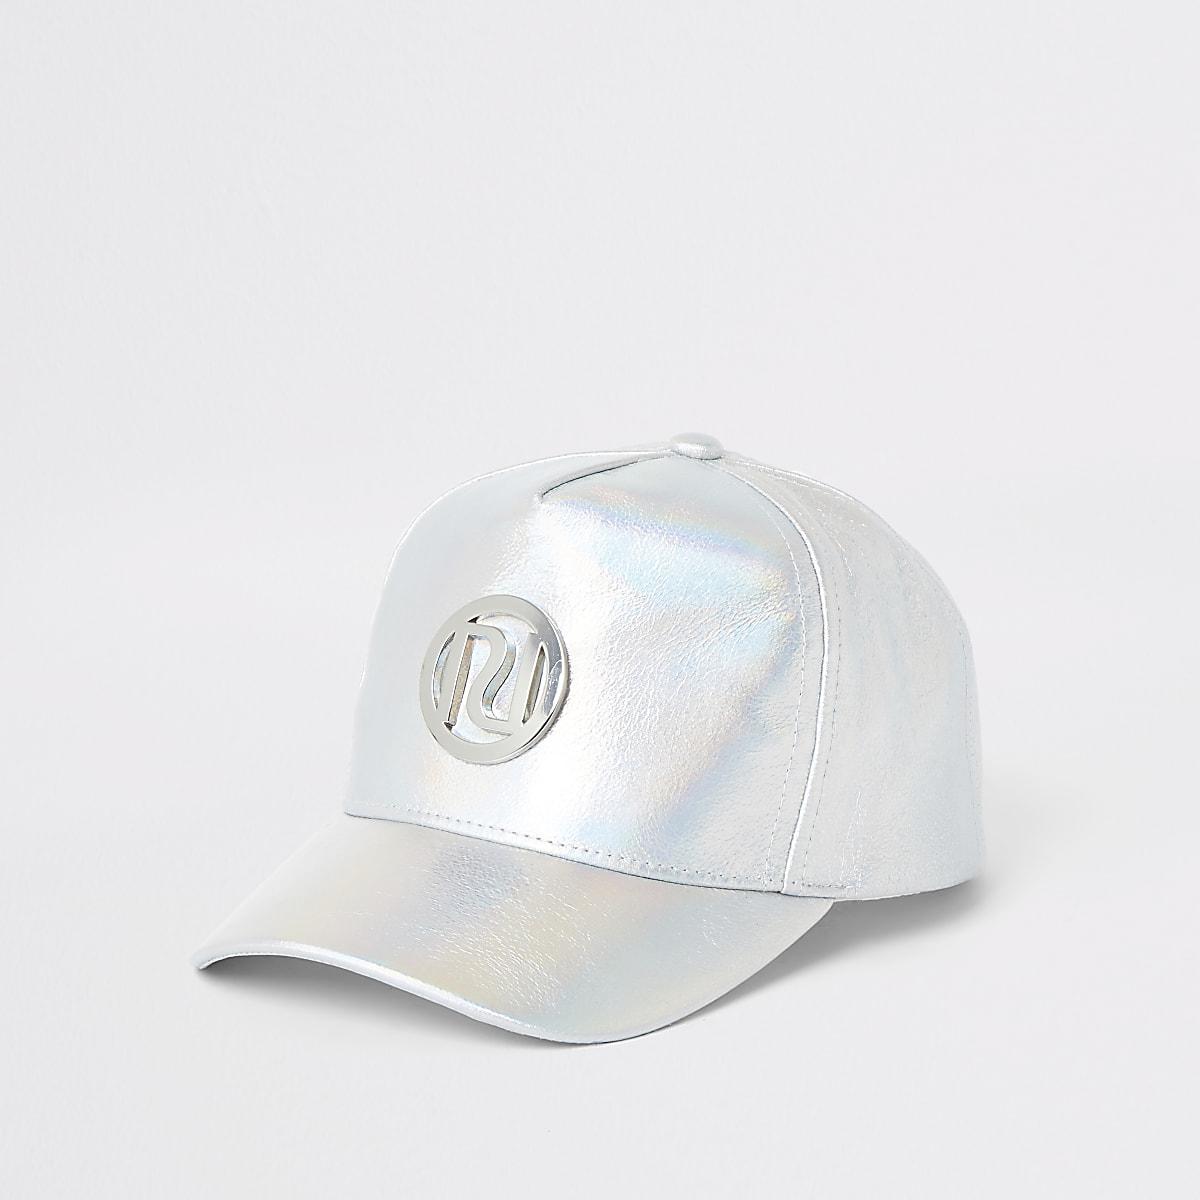 Silberfarbene, holografische Kappe